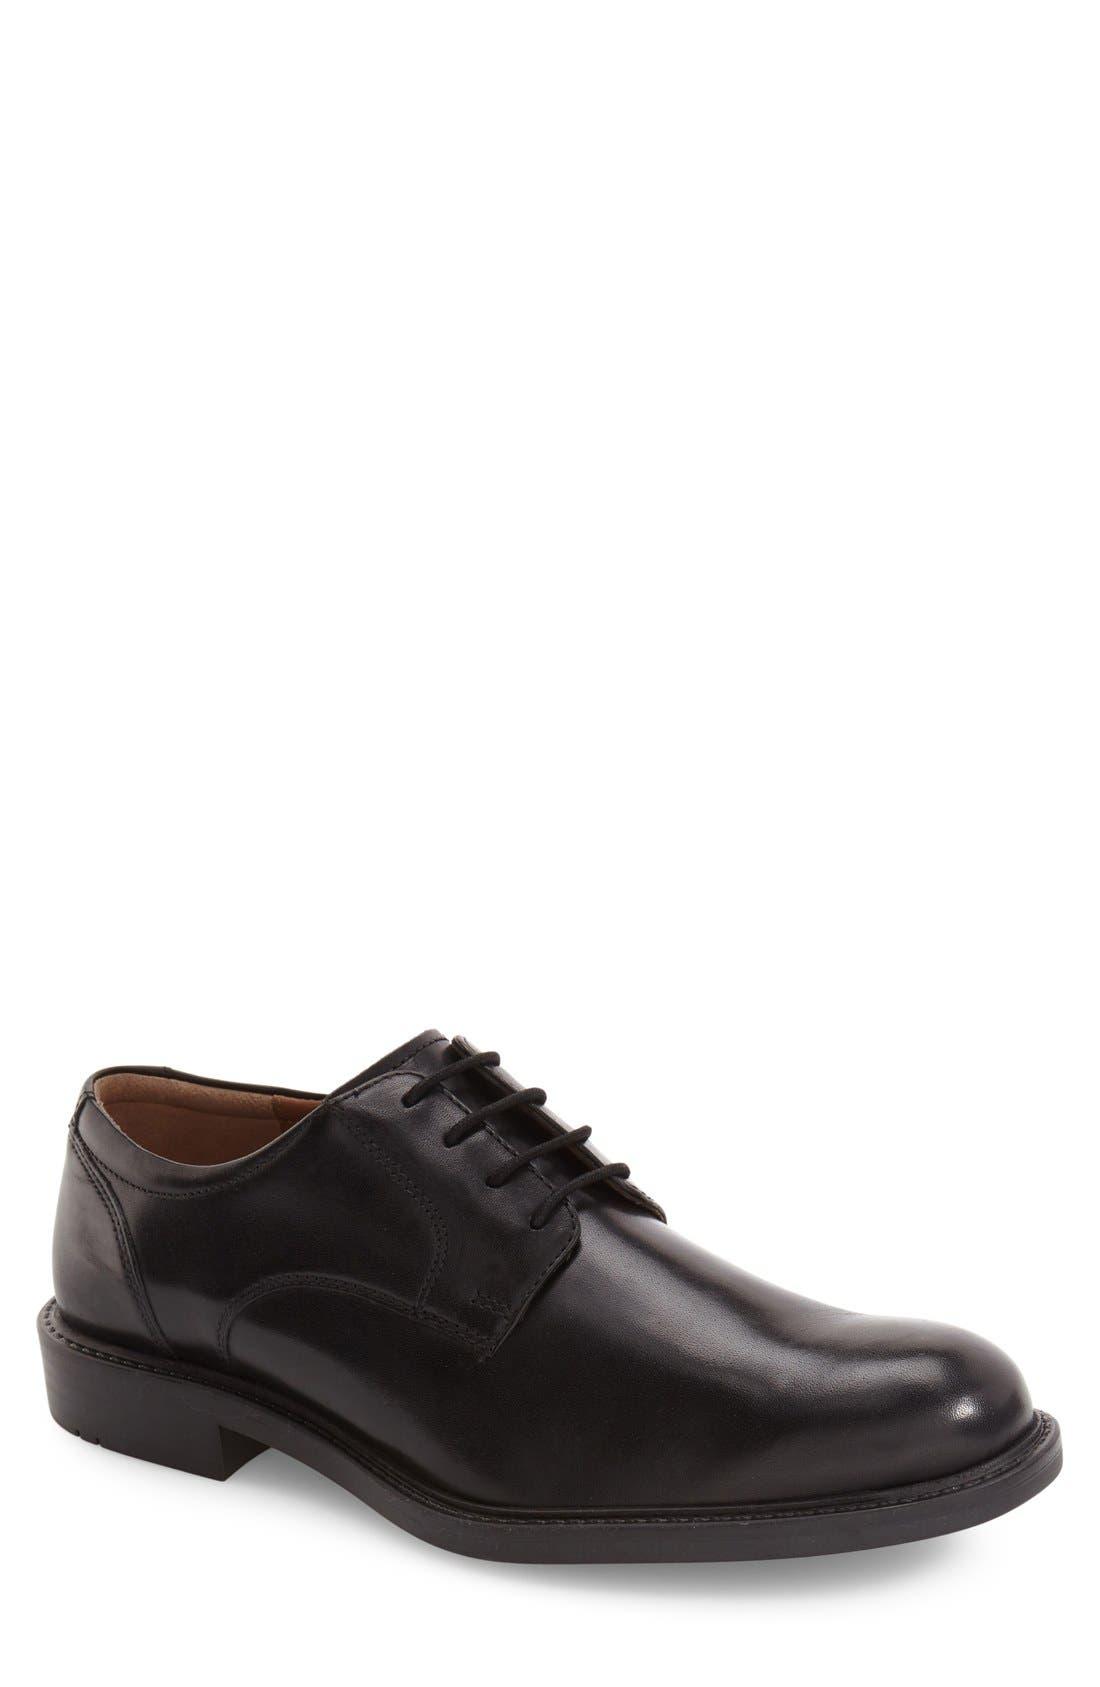 Tabor Plain Toe Derby,                         Main,                         color, BLACK LEATHER